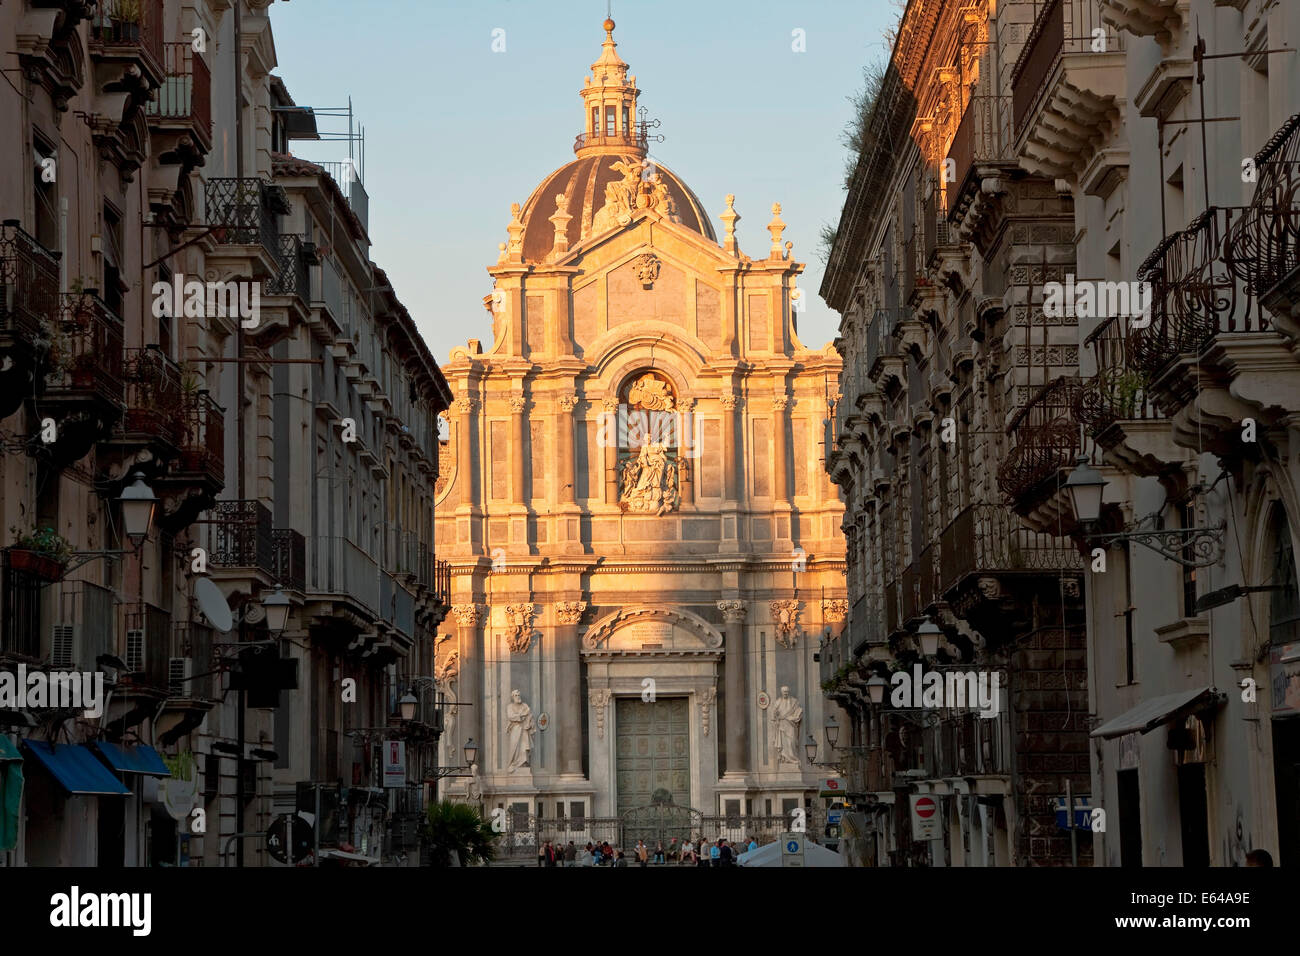 Außenansicht der Kathedrale Sant Agata, Catania, Sizilien, Italien Stockbild